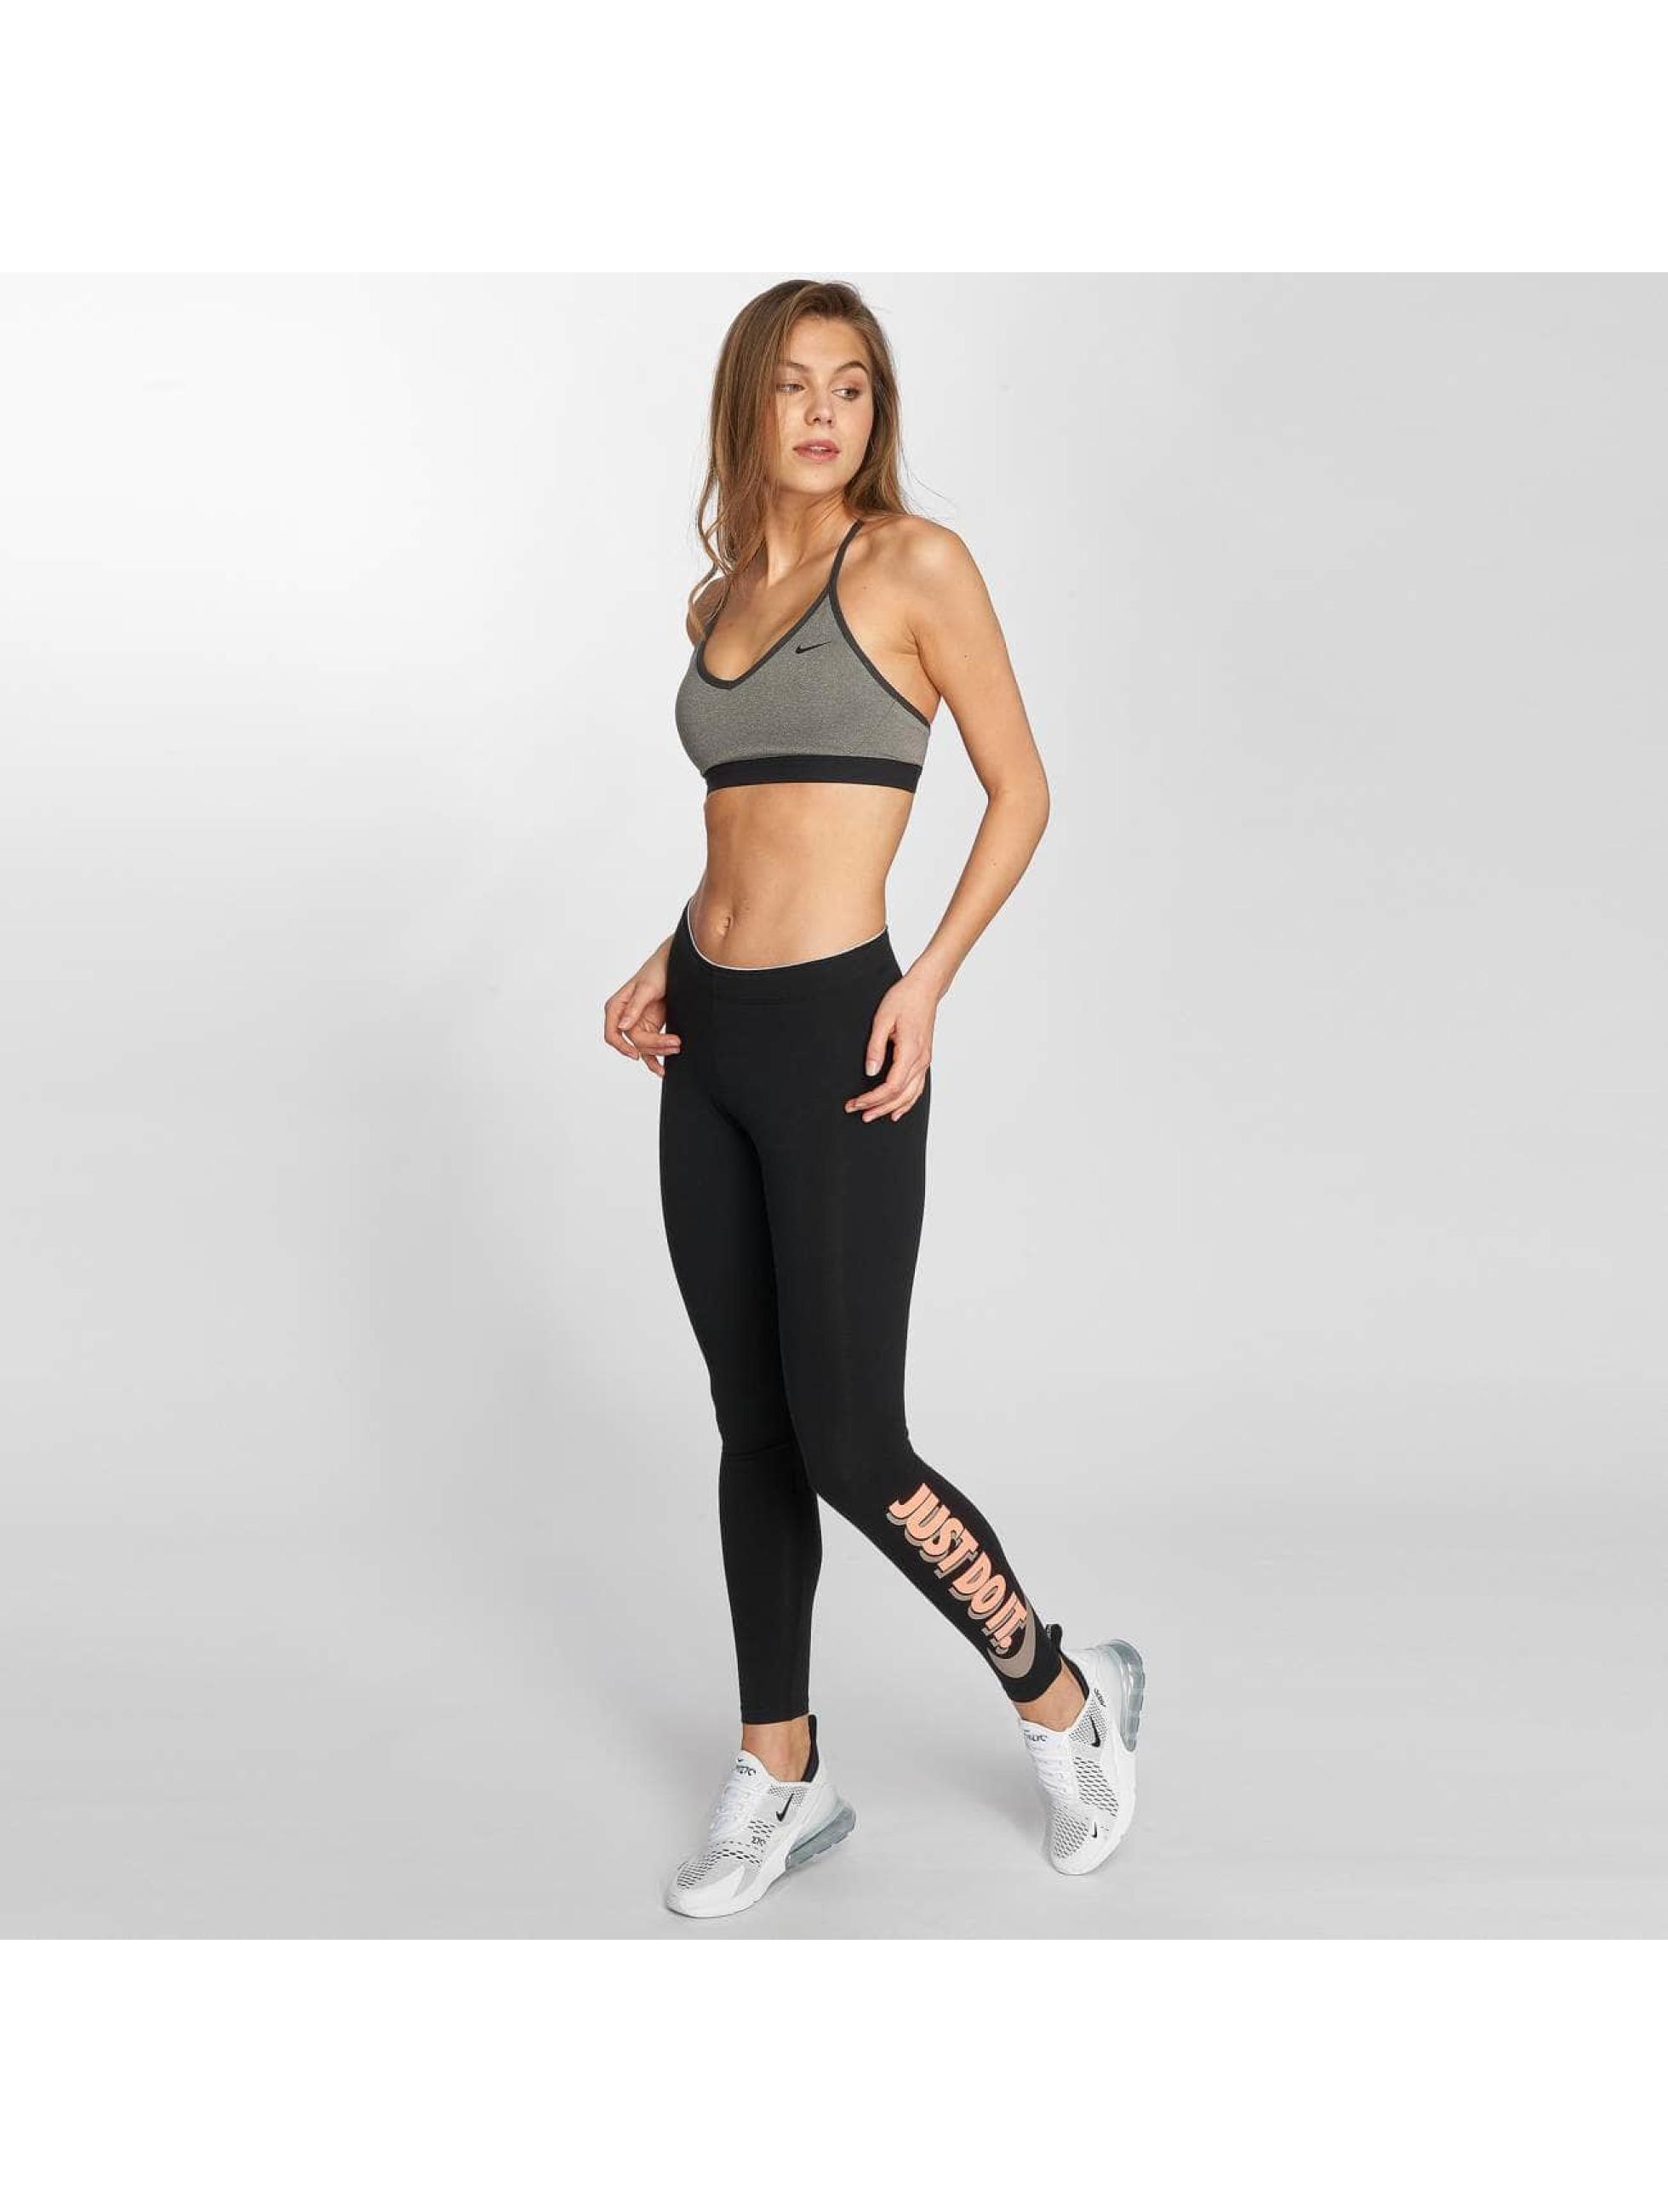 Nike Performance Sports Bra Indy gray